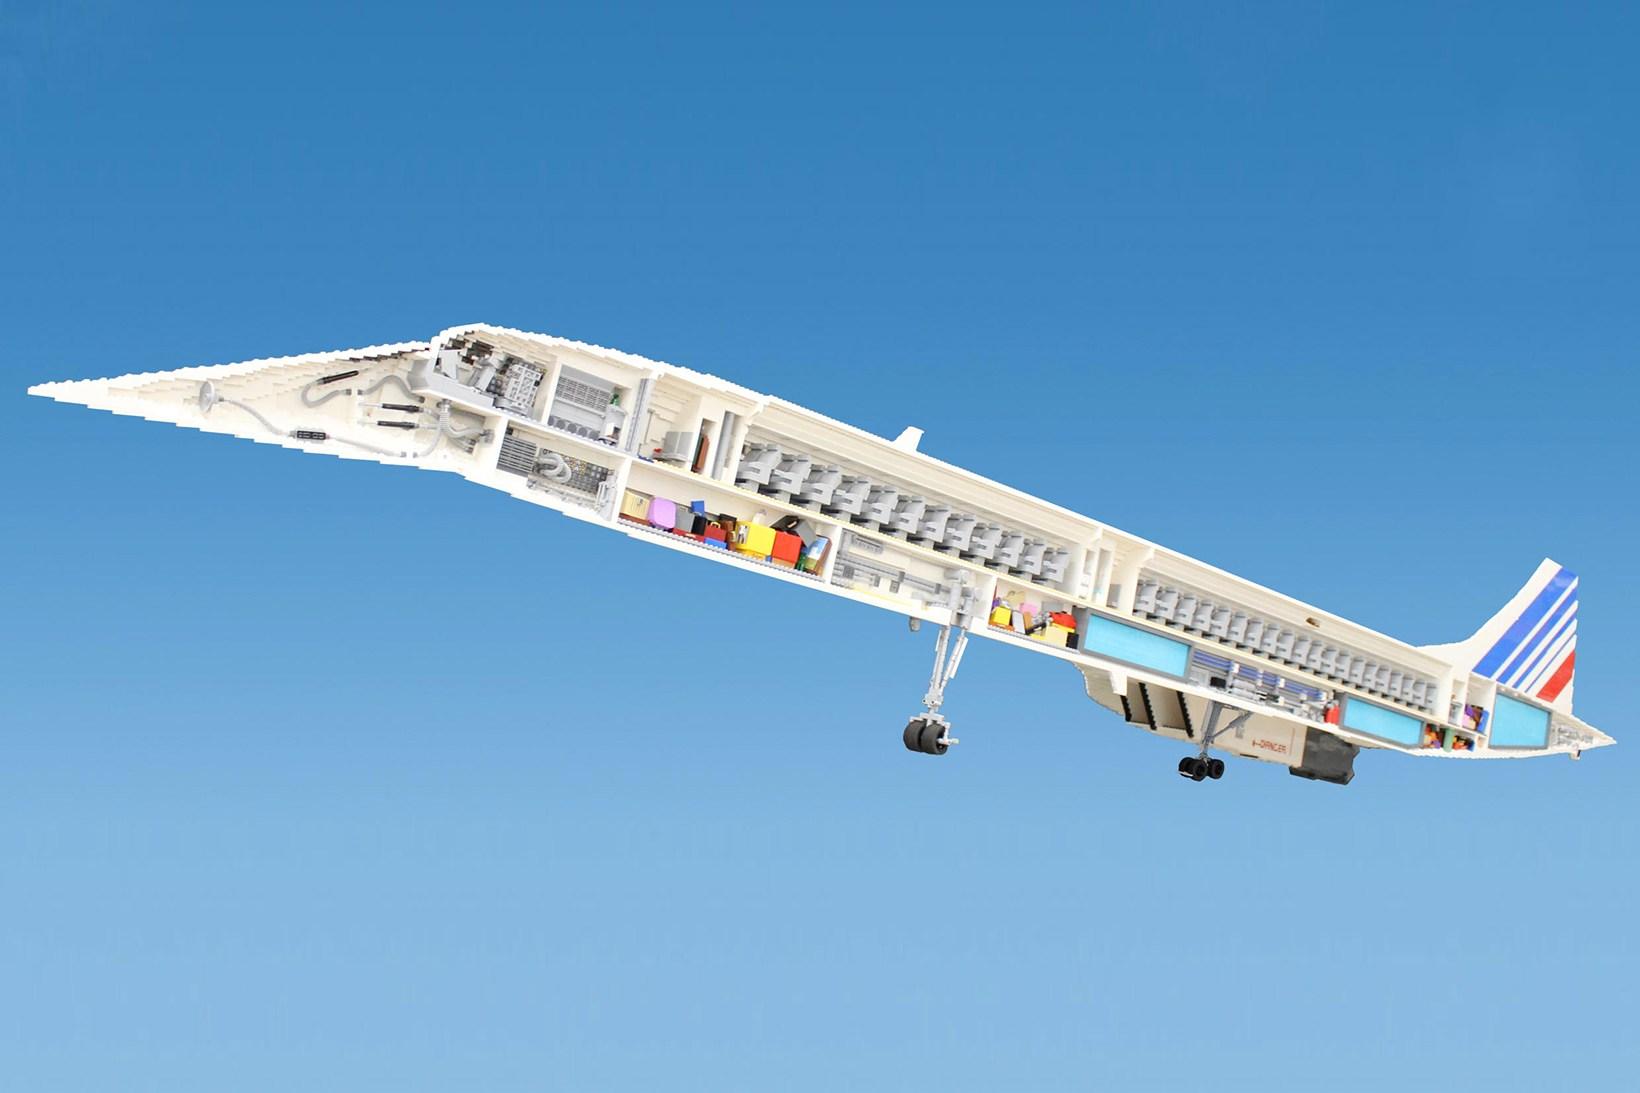 LEGO-concorde-plane-2